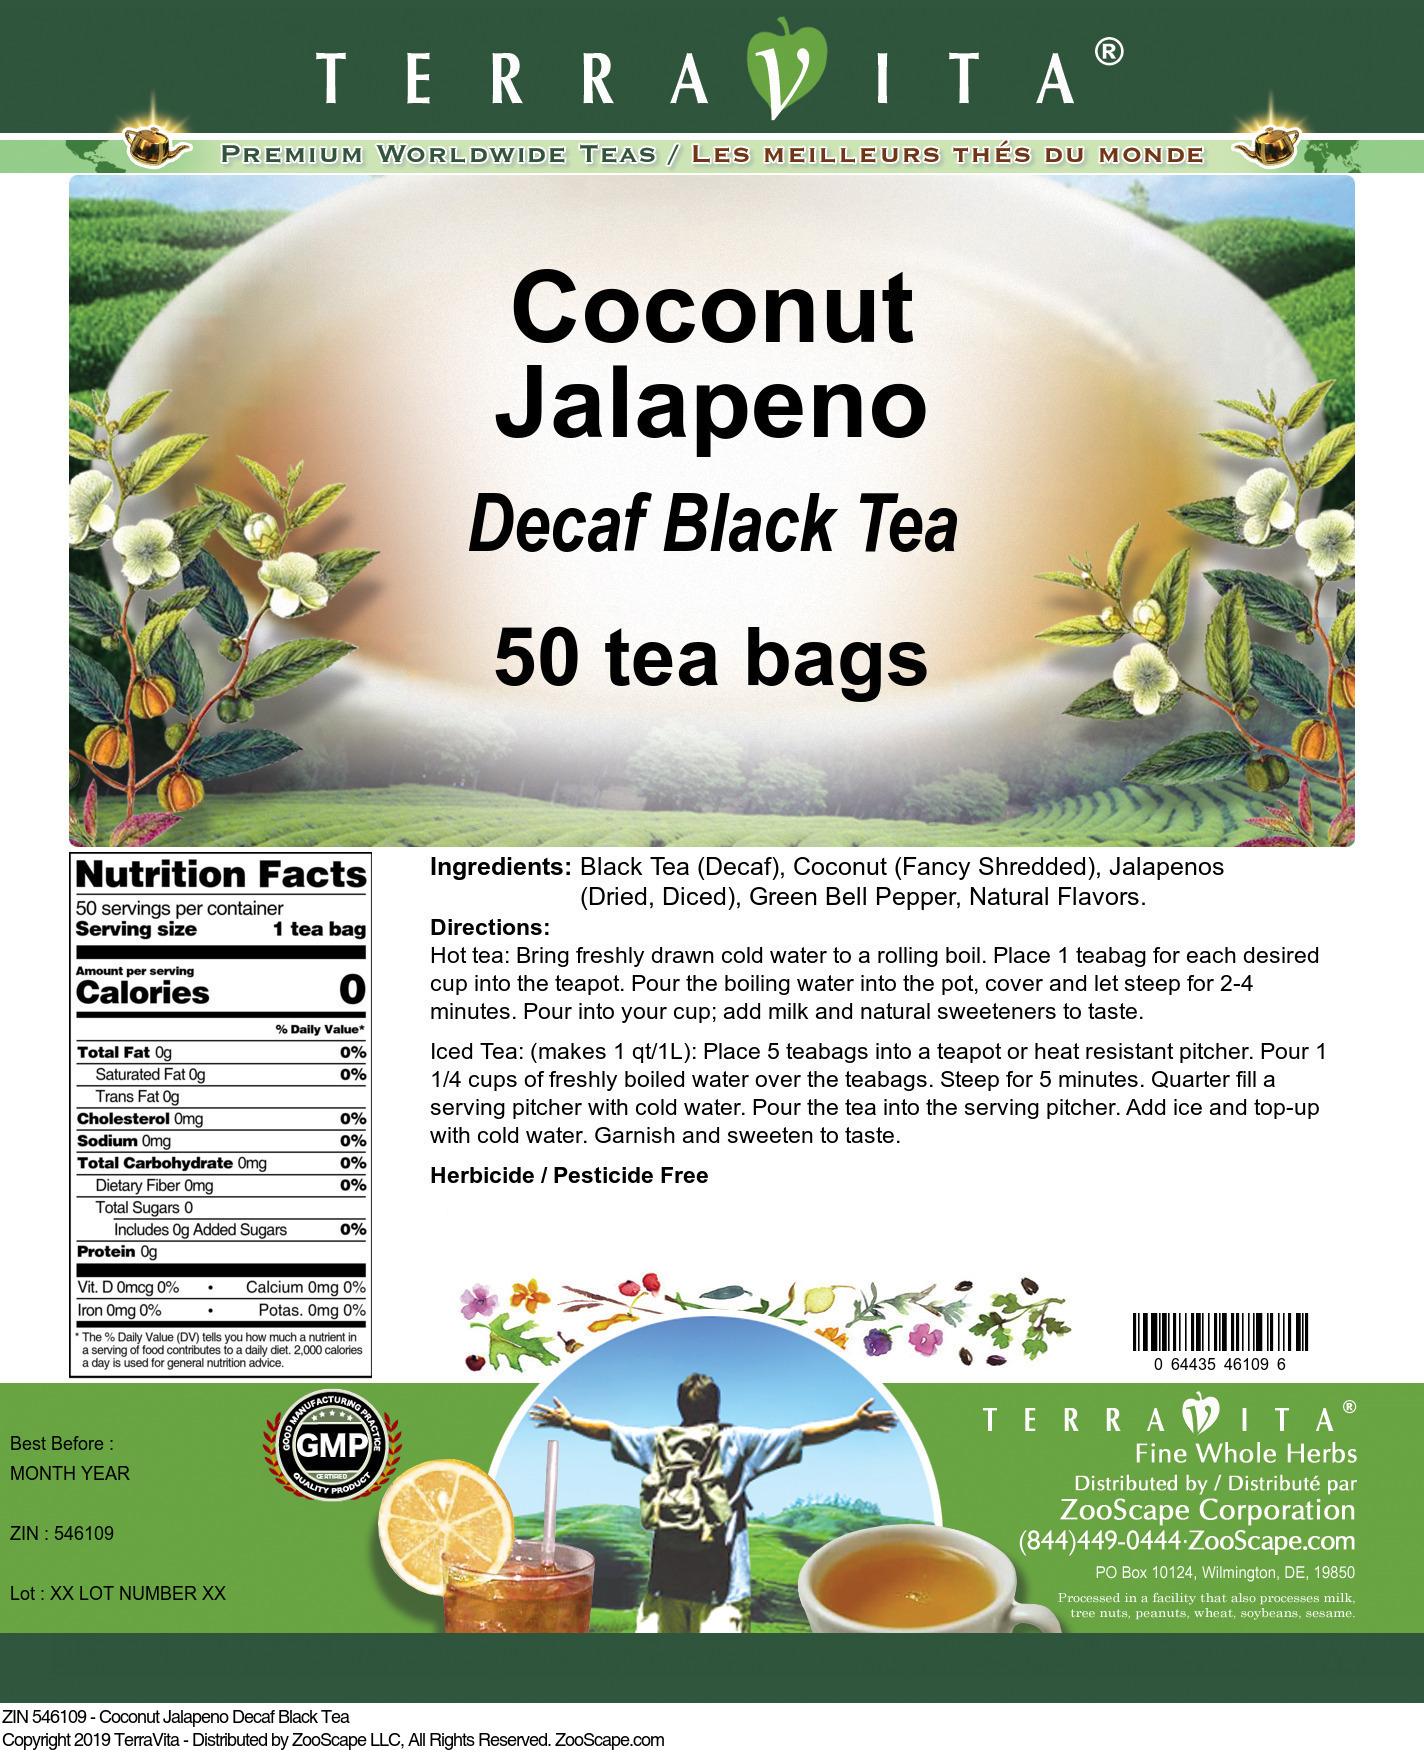 Coconut Jalapeno Decaf Black Tea